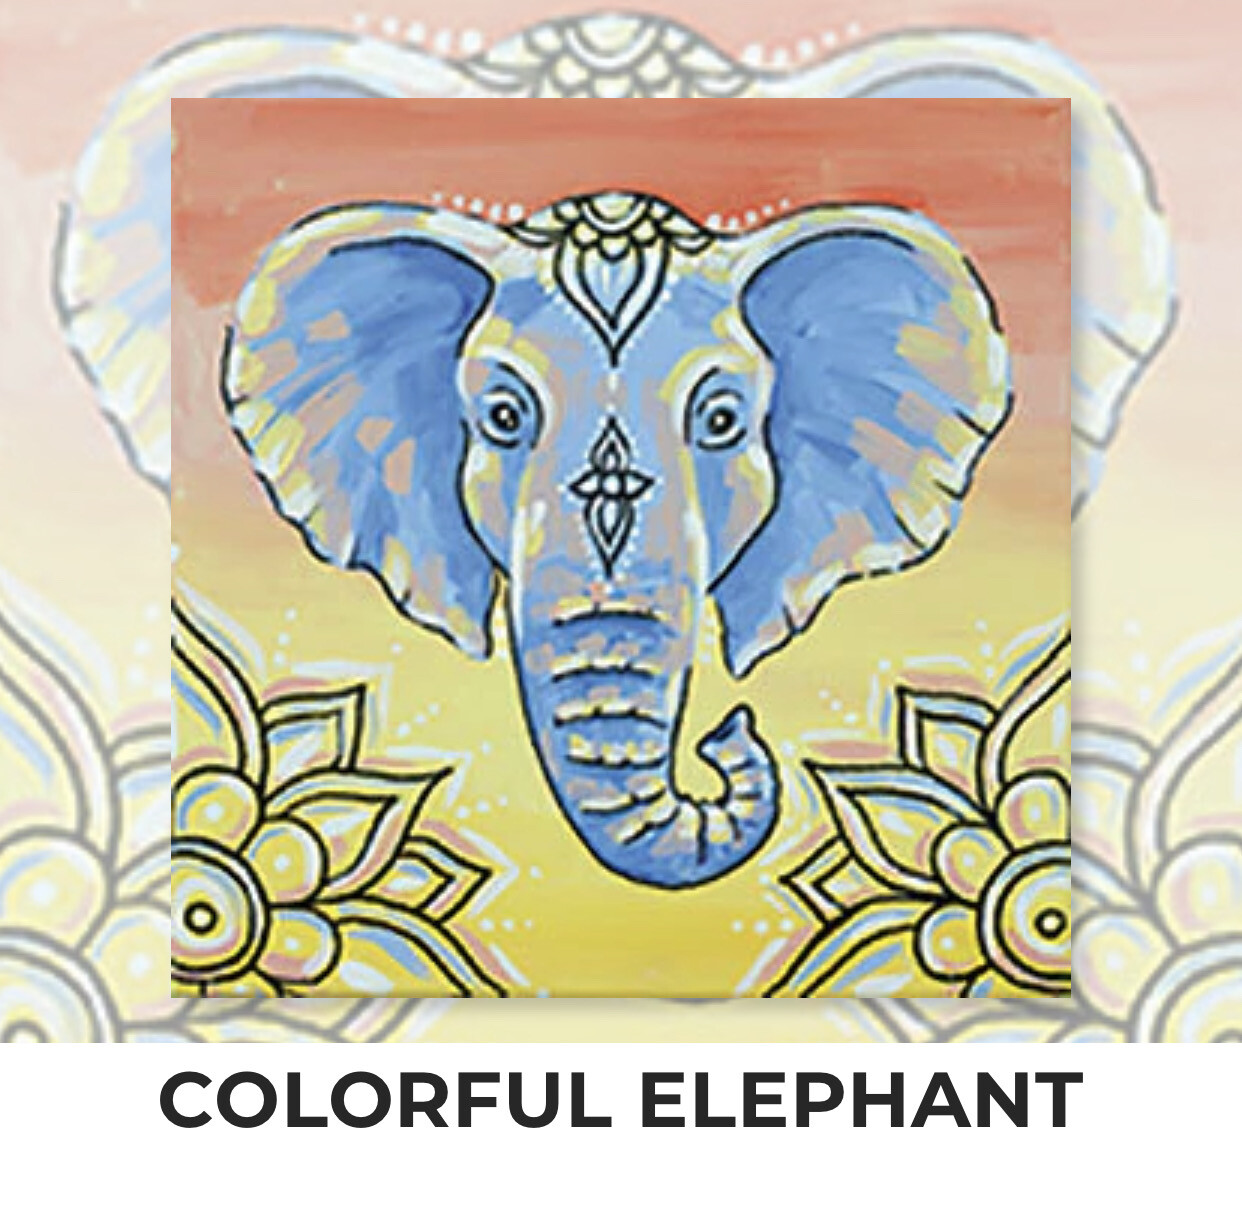 Colorful Elephant KIDS Acrylic Paint On Canvas DIY Art Kit